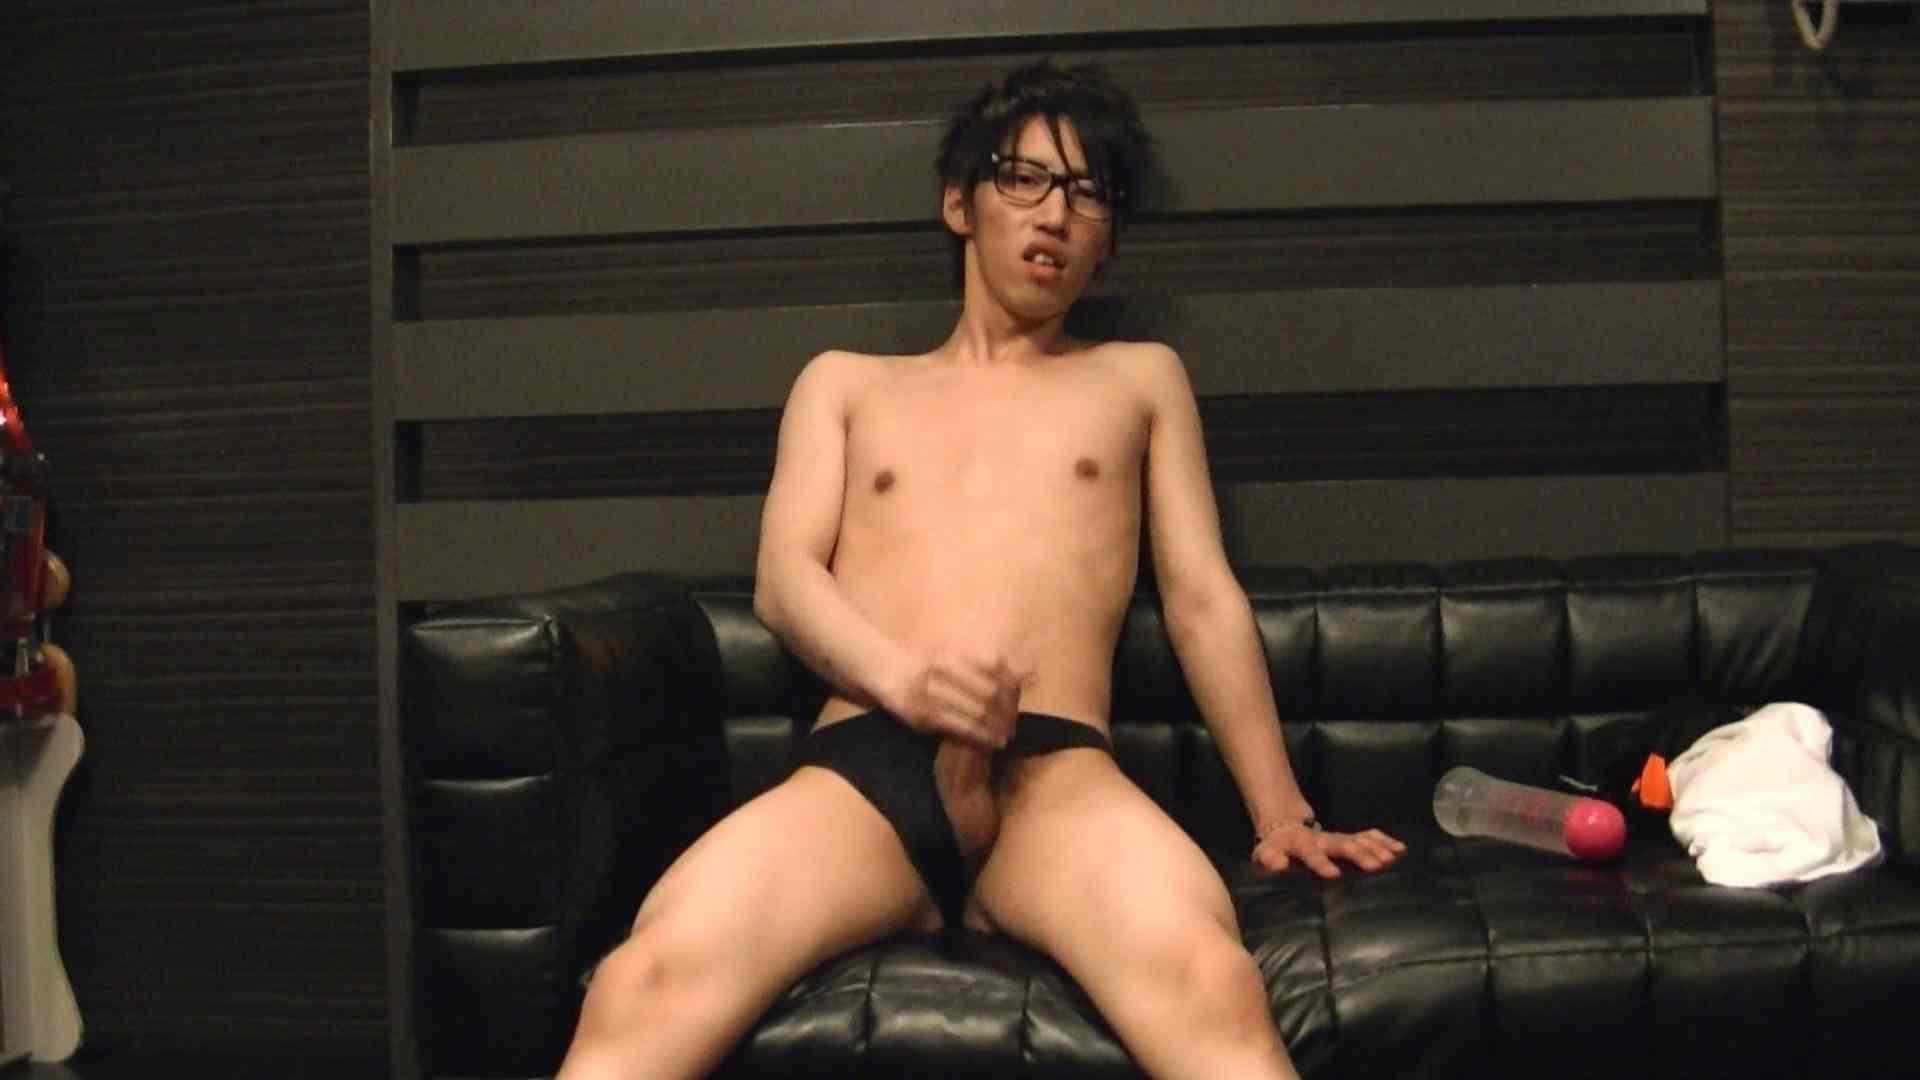 Mr.オナックスさん投稿!HD 貴方のオナニー三万円で撮影させてください。VOL.04 ノンケのオナニー ゲイアダルト画像 55連発 3